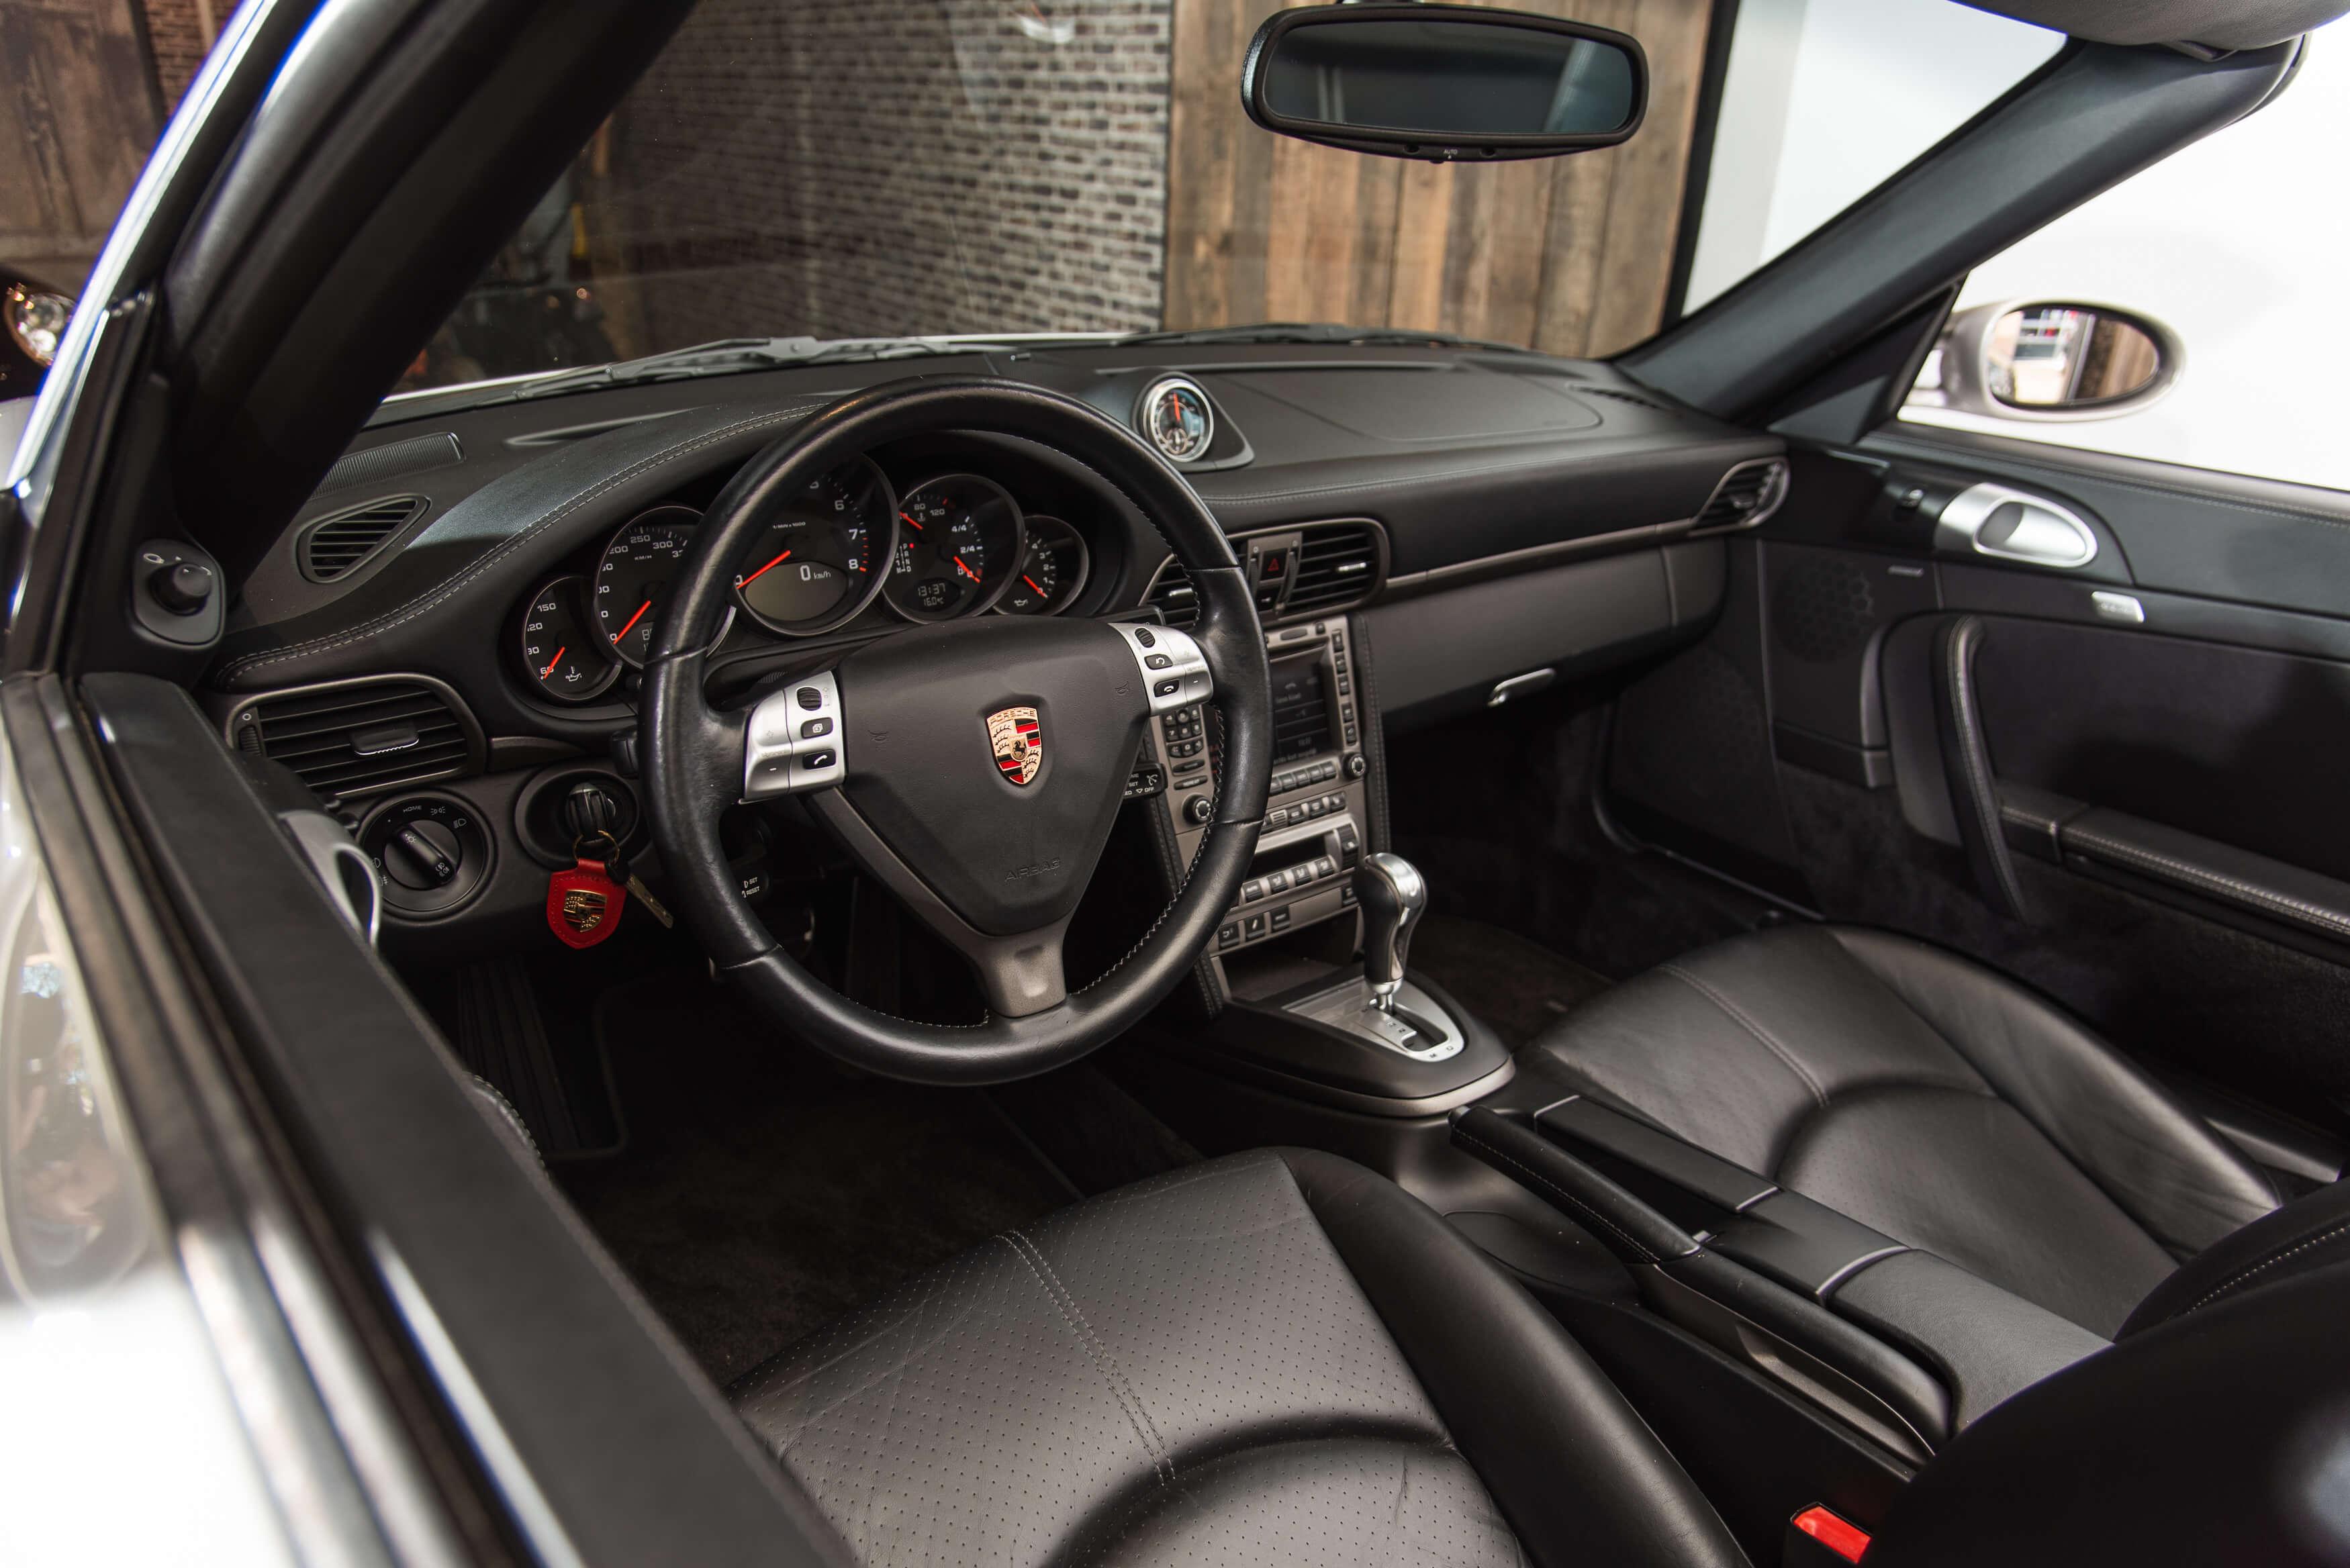 Porsche 997 Carrera 2 automaat Car Service Visser gespecialiseerd in Porsche - 16